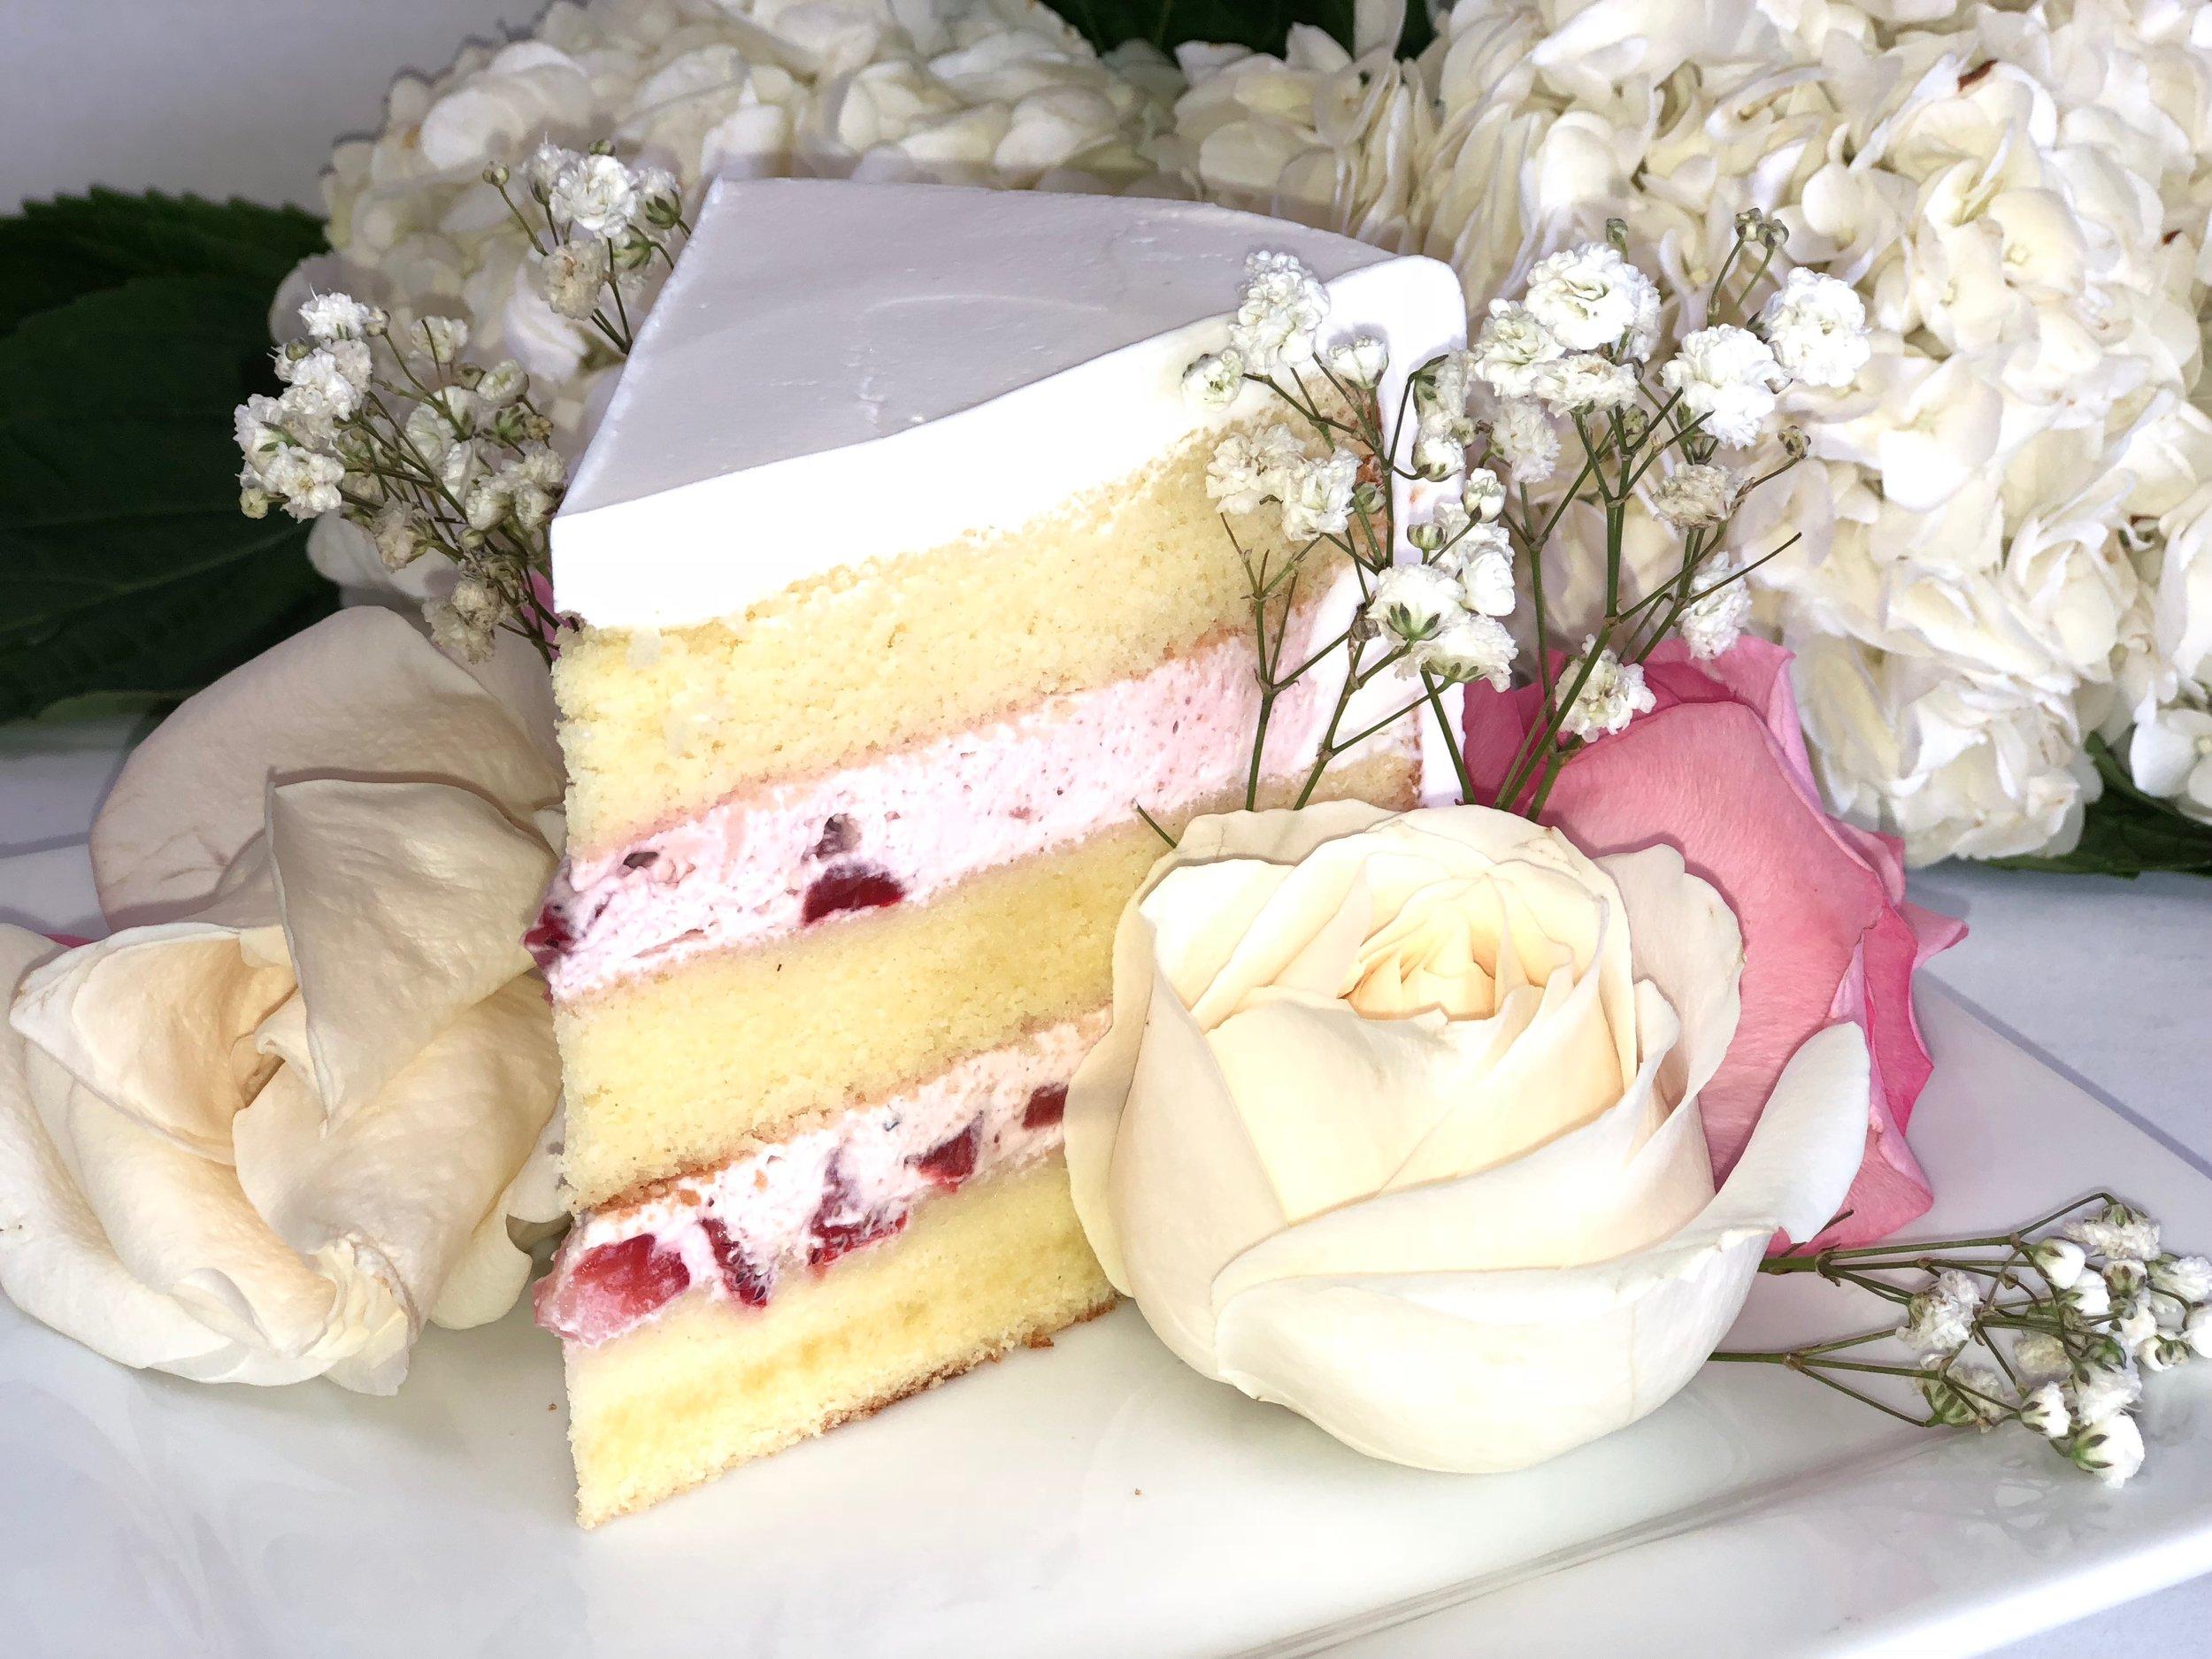 Pricing And Flavors Skazka Desserts Bakery Nj Custom Birthday Cakes Cupcakes Shop